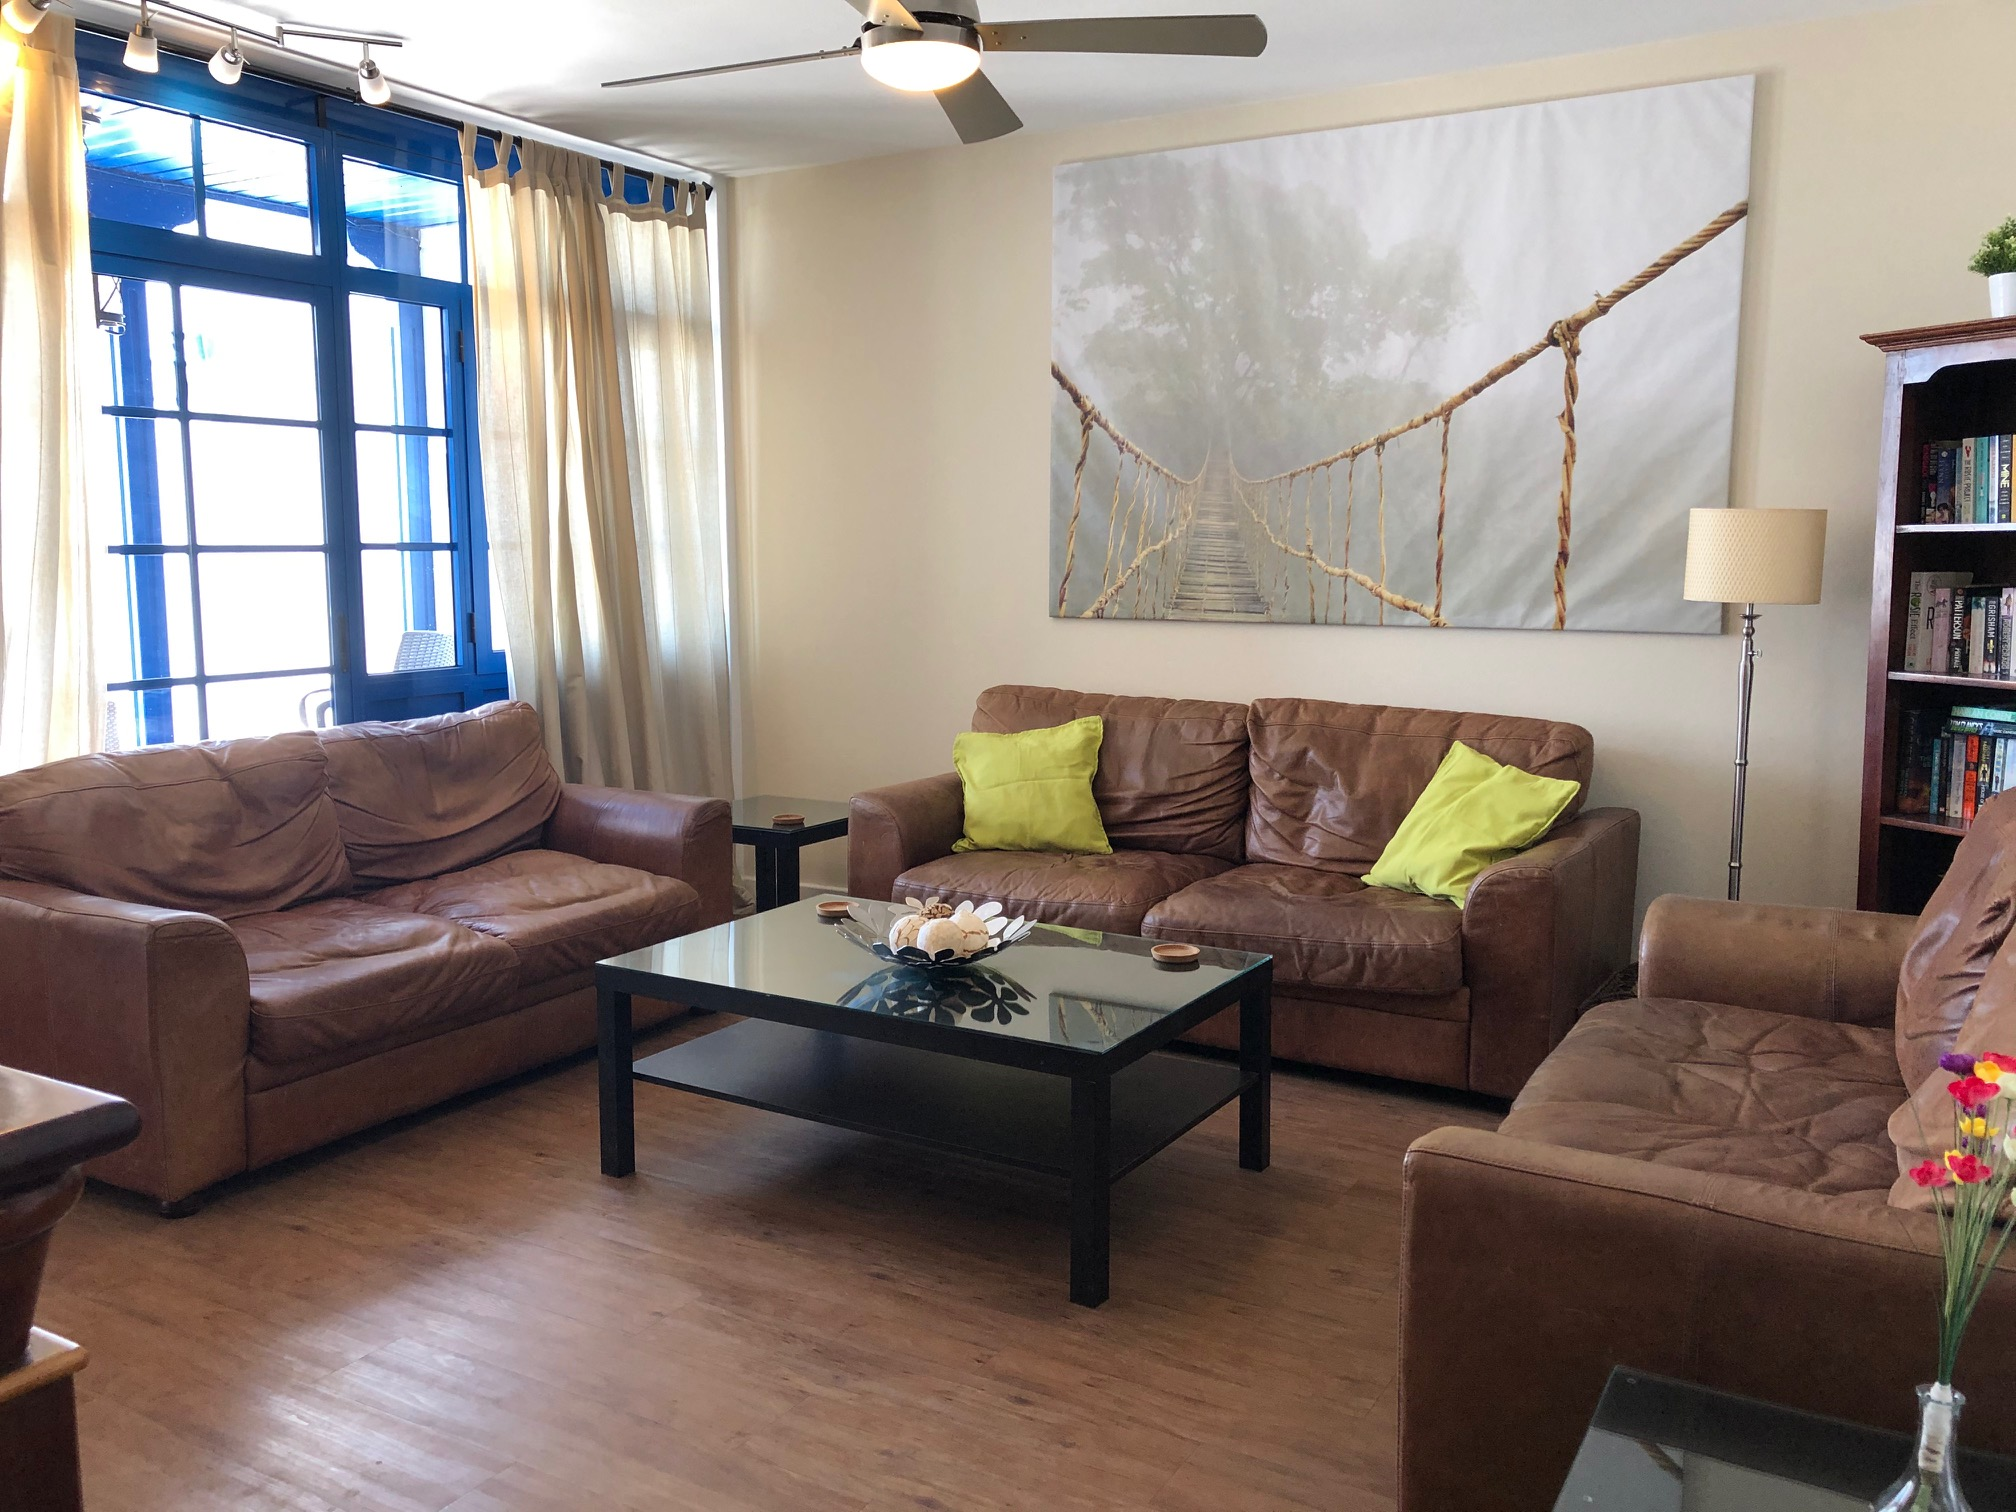 Apartment LVC261005 3 Bedroom self catering apartment